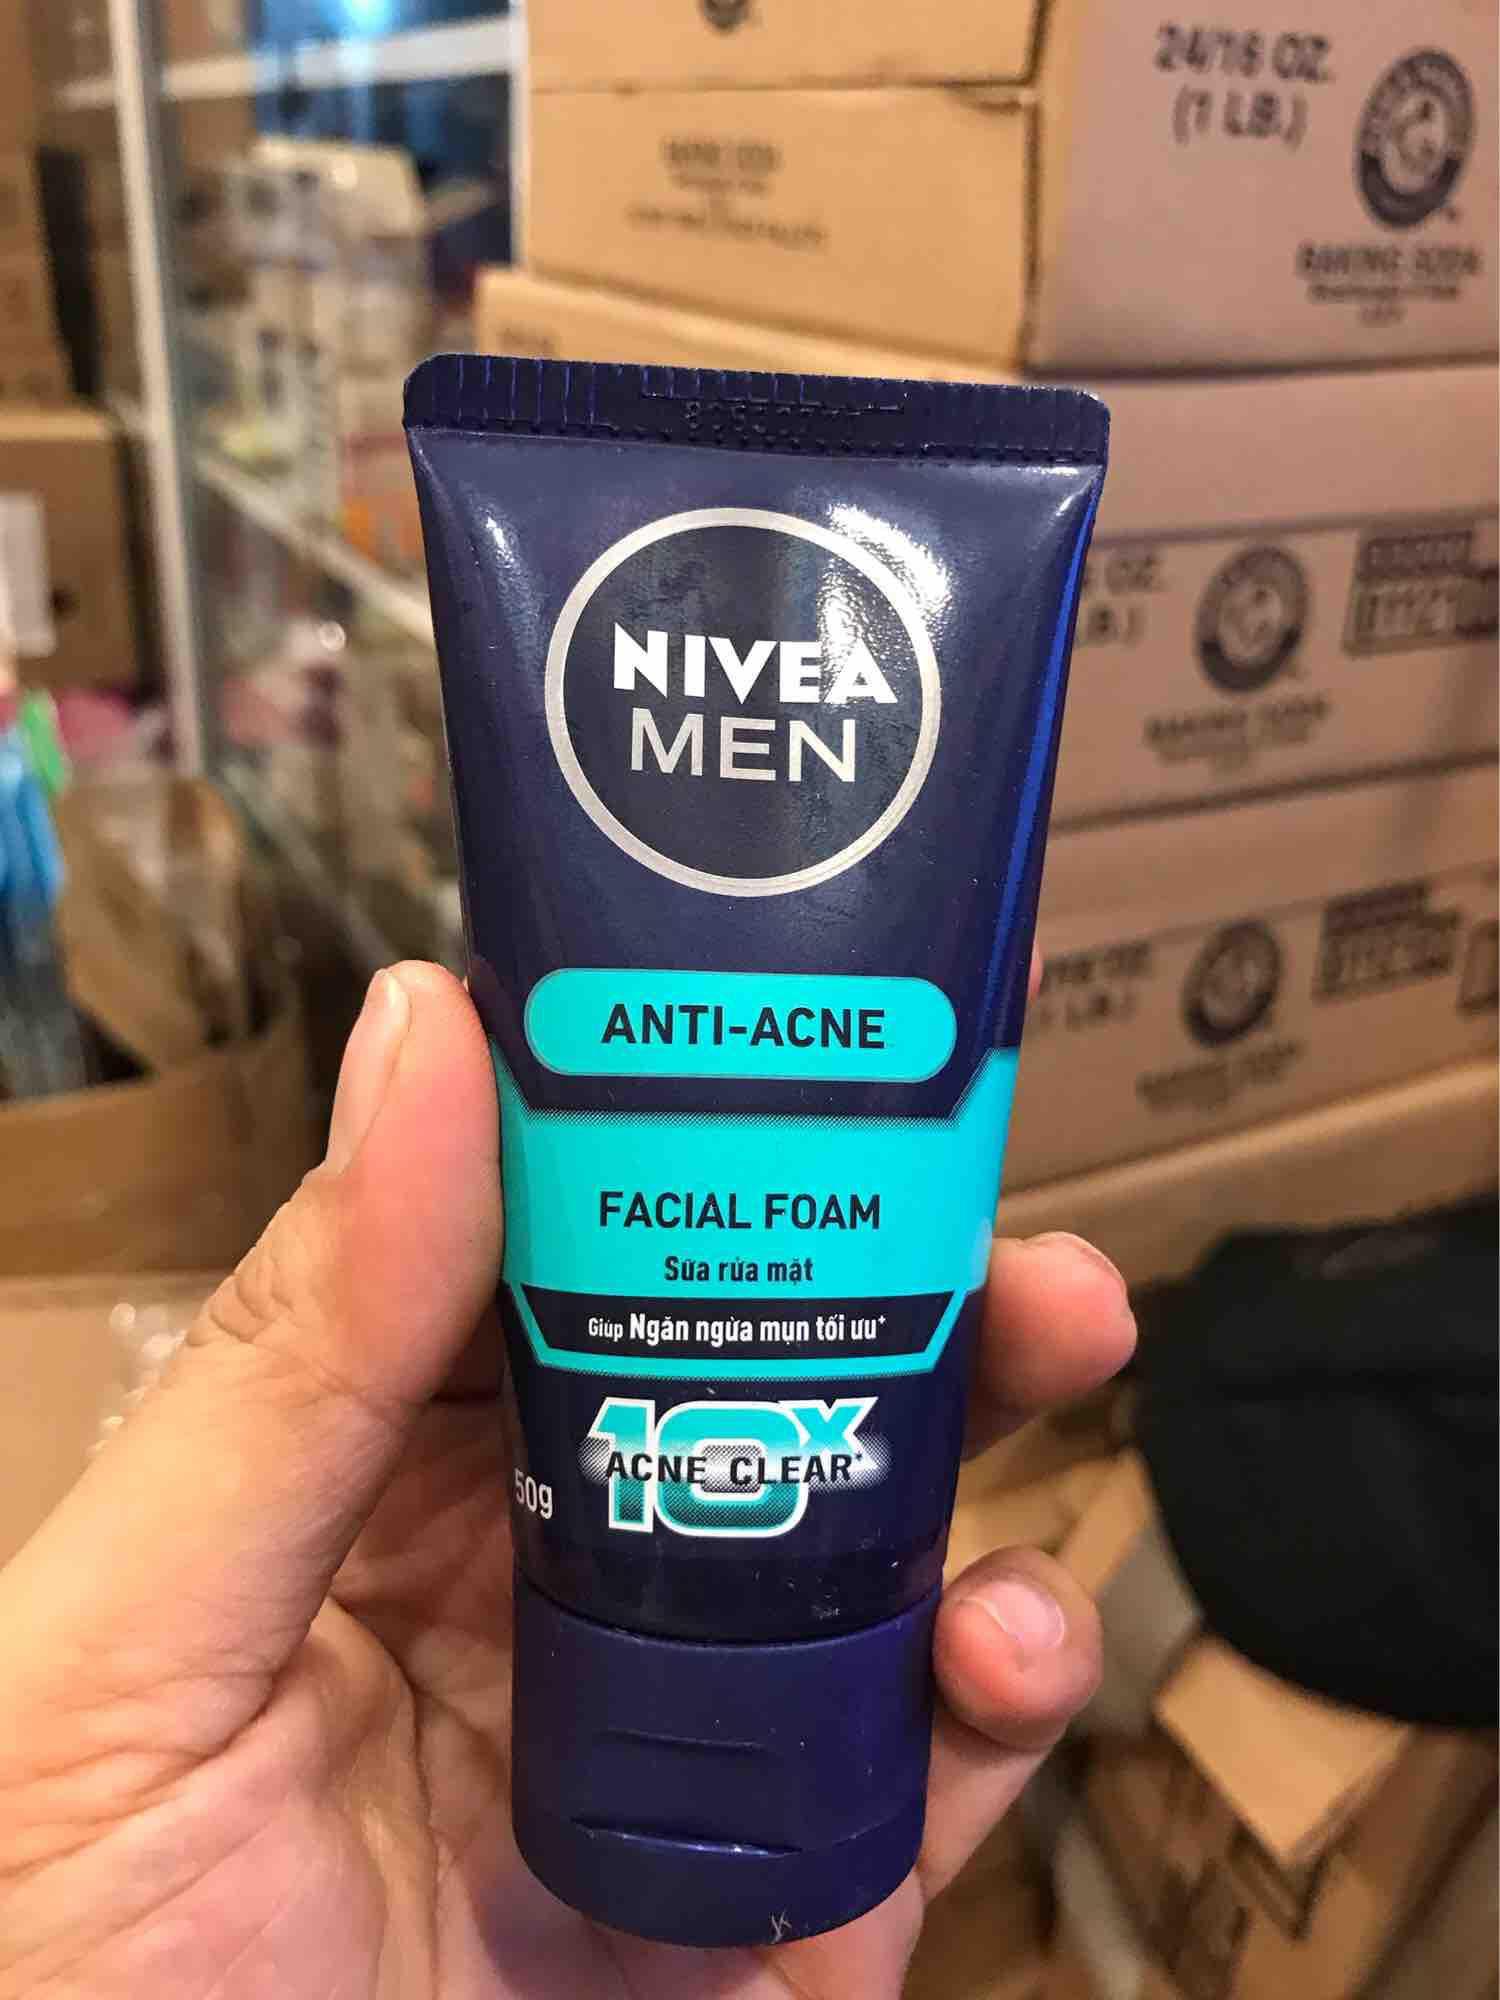 Sữa rửa mặt trị mụn cho nam Nivea Men Anti Acne Facial Foam 2